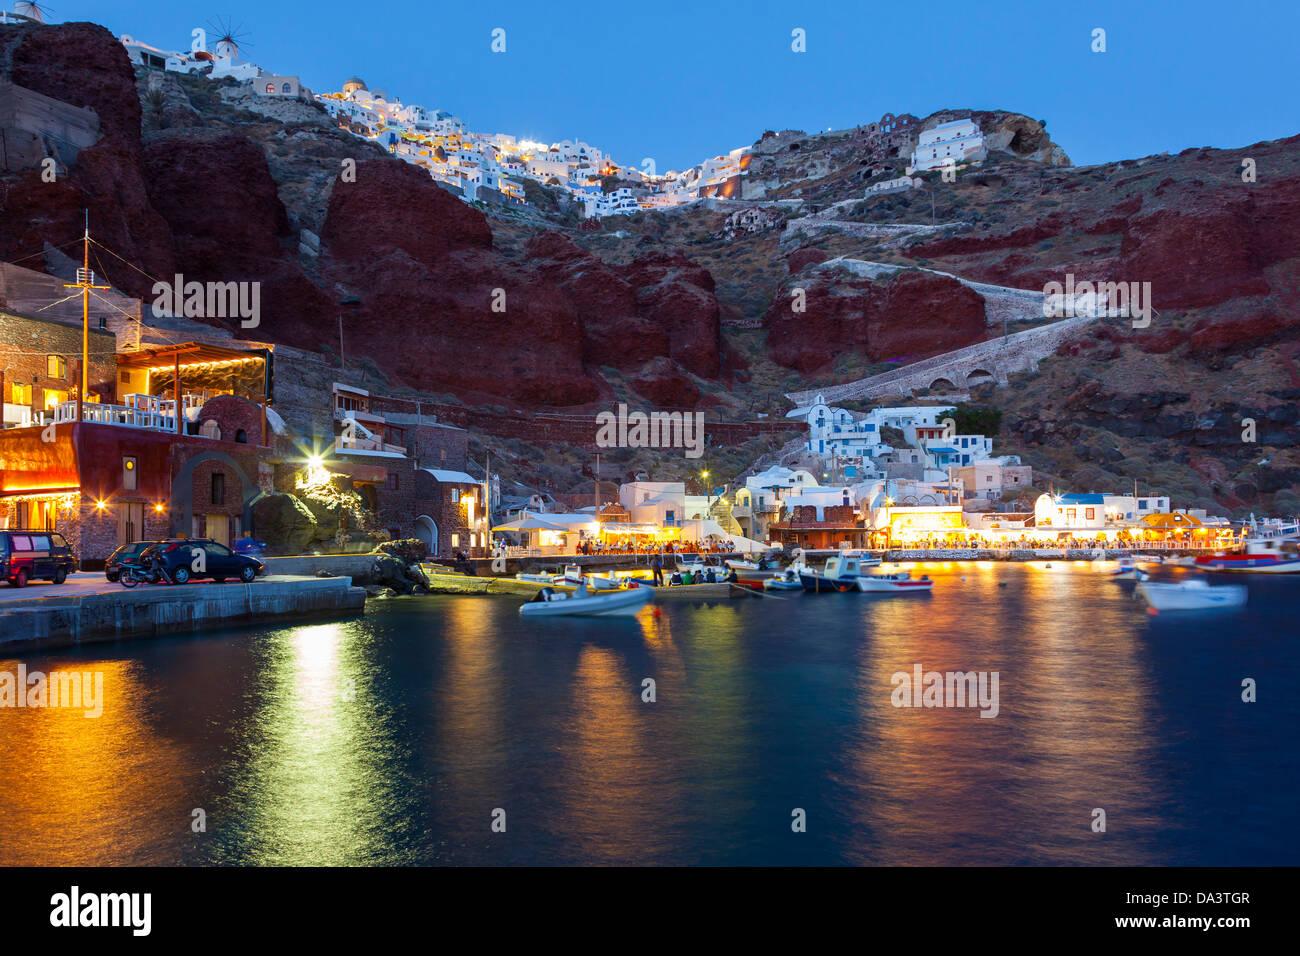 Night shot of Ammoudi Bay with Oia Santorini Greece above. - Stock Image